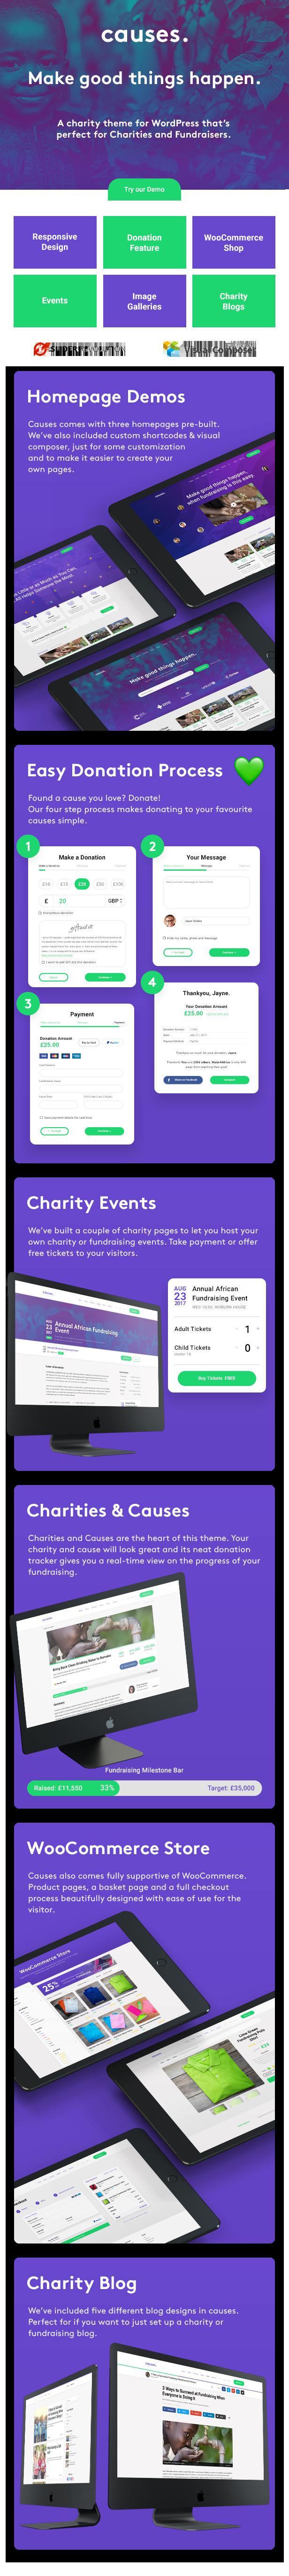 JustGive - Charity & Fundraising WordPress Theme